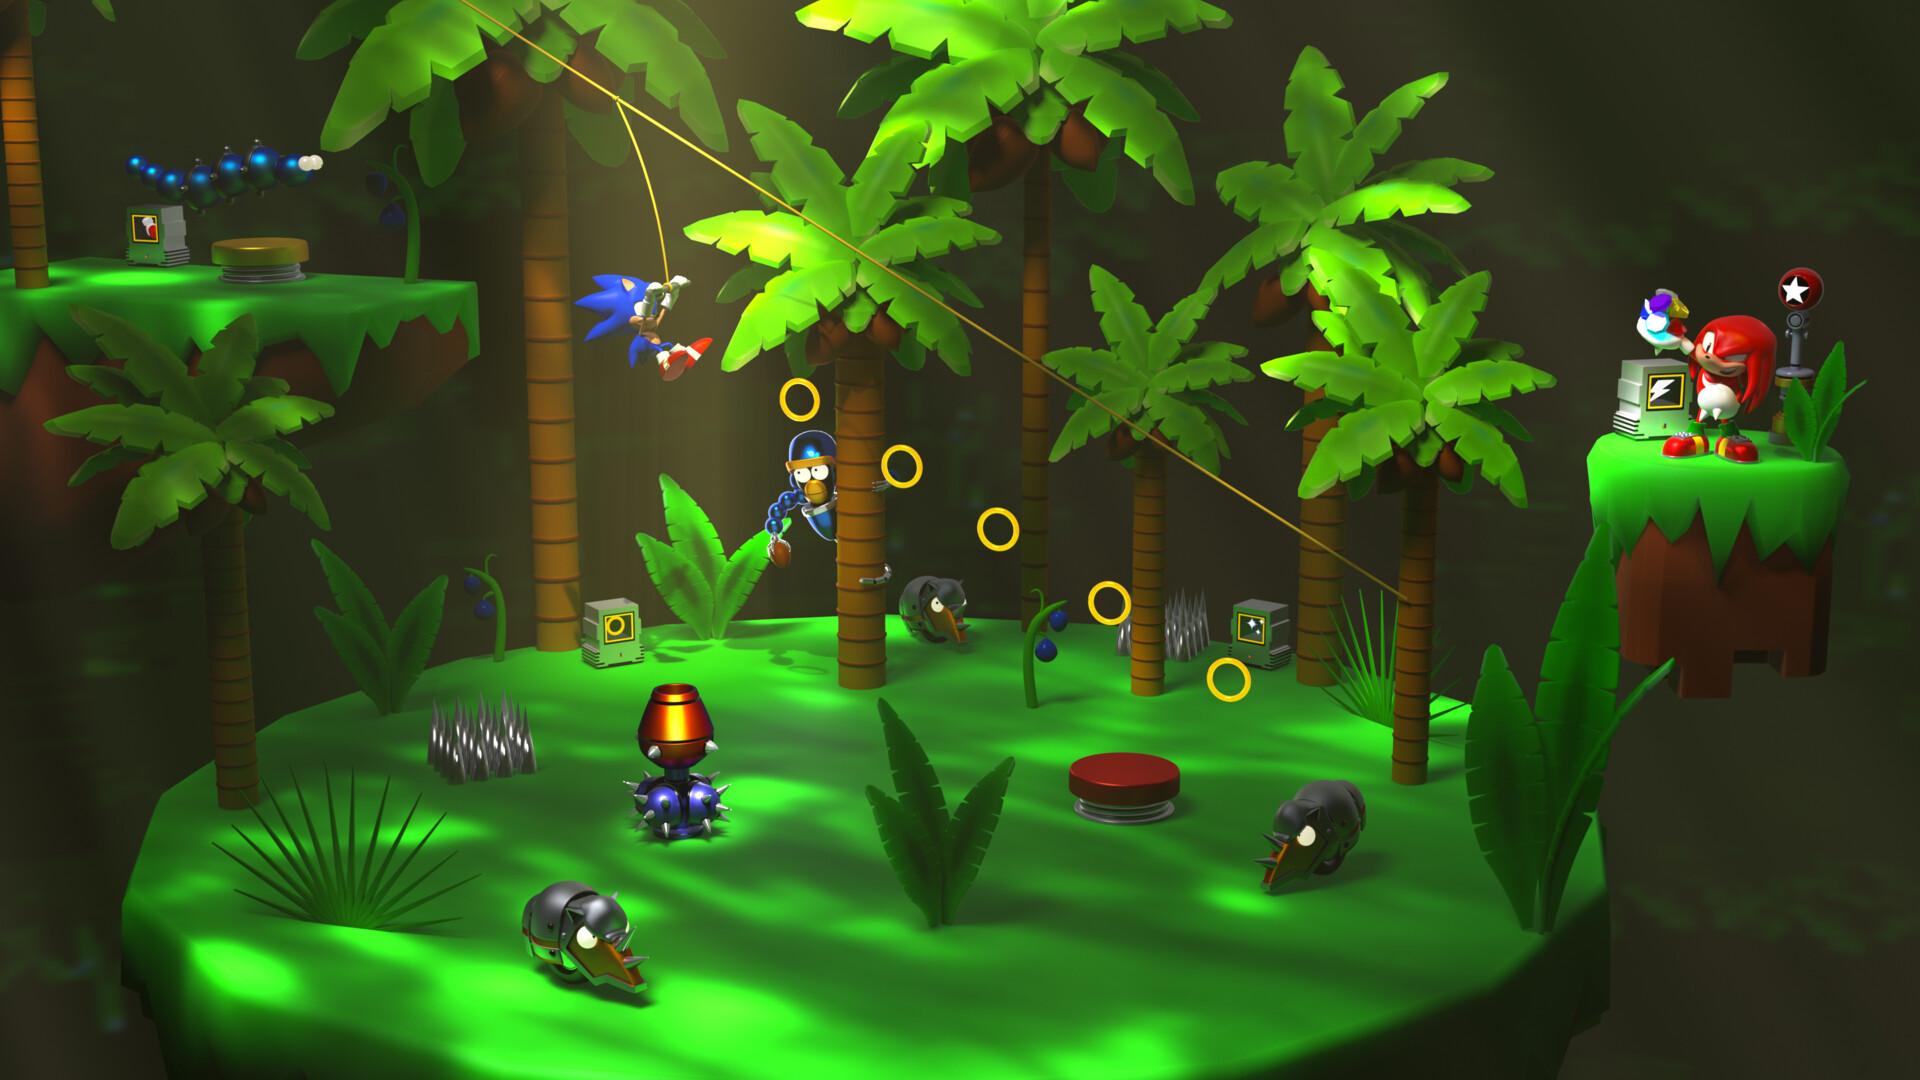 Caelum Beckinsale Sonic The Hedgehog 3 Angel Island Zone Diorama And Badniks